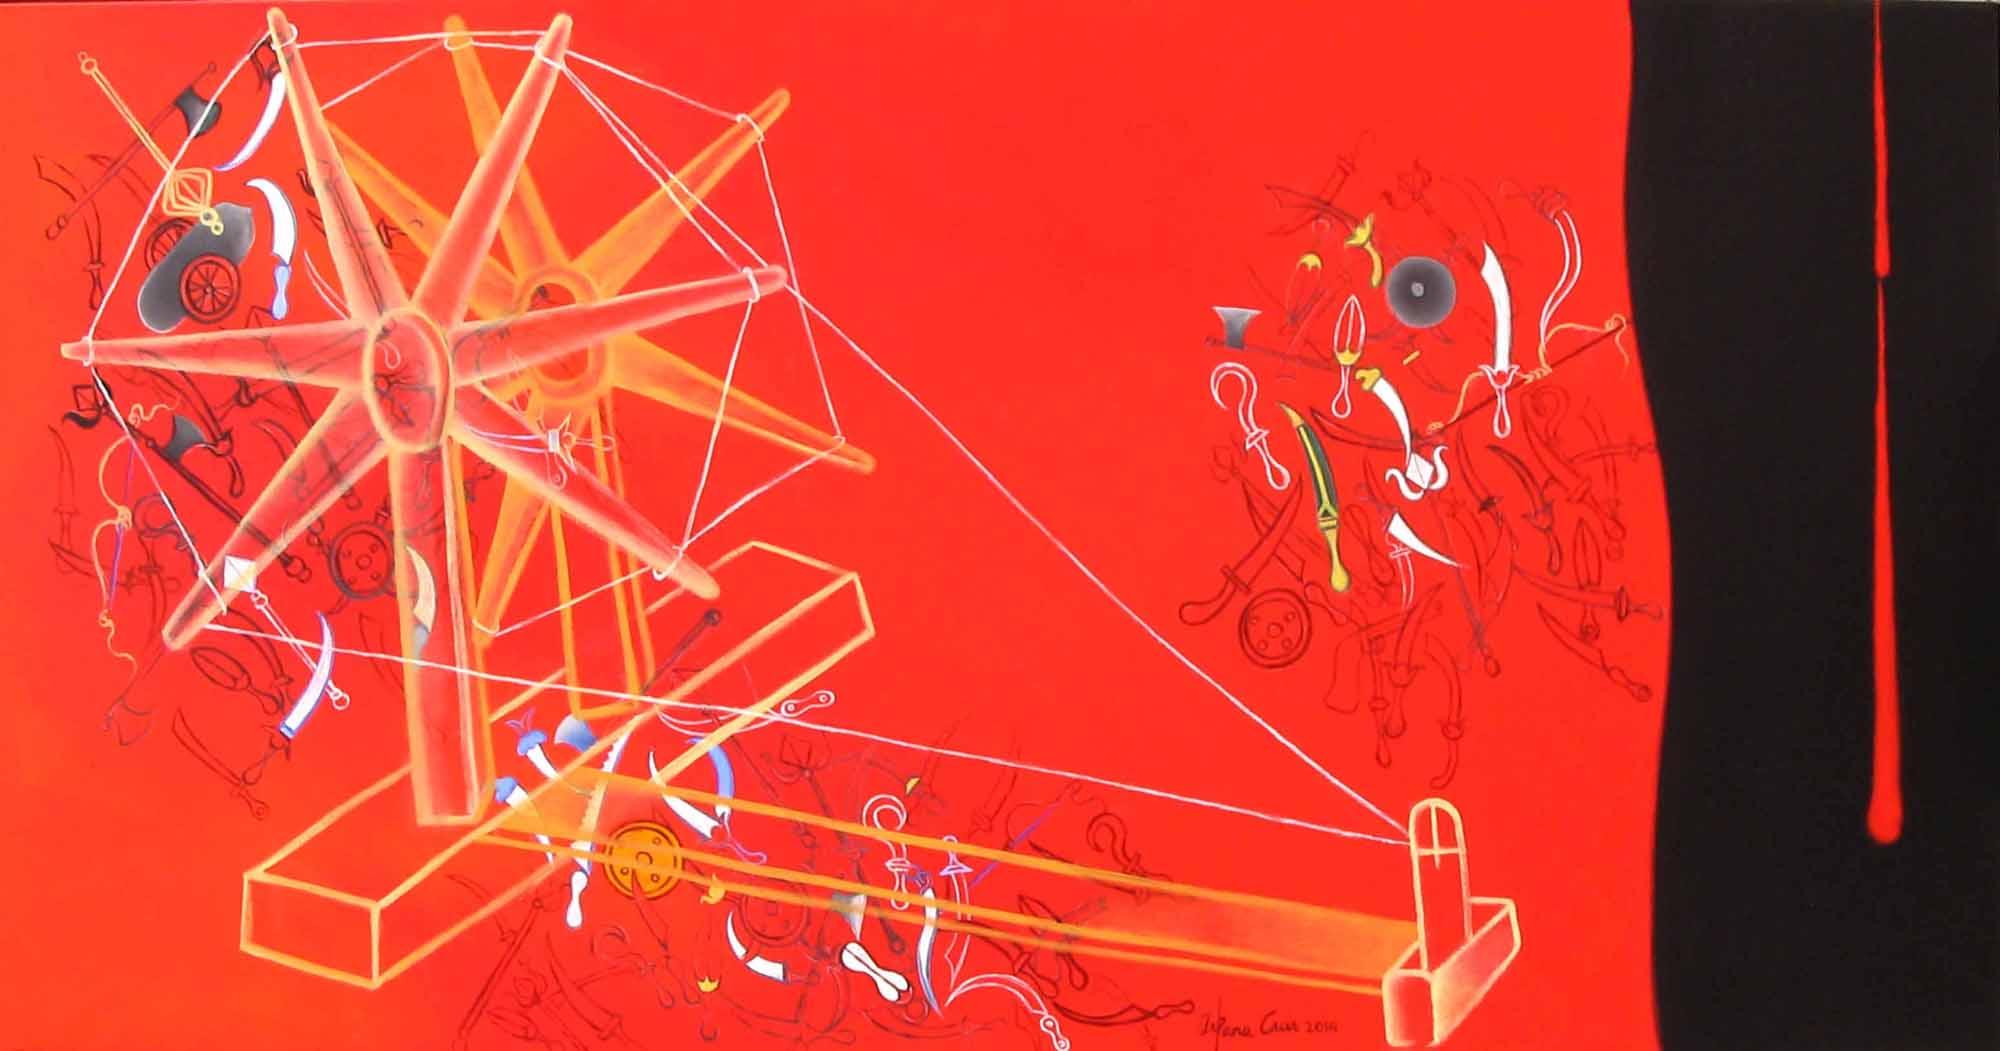 Fig. 5. Arpana Caur, <em>Charkha (Red)</em>, oil on canvas, 2014<br />Image courtesy the artist